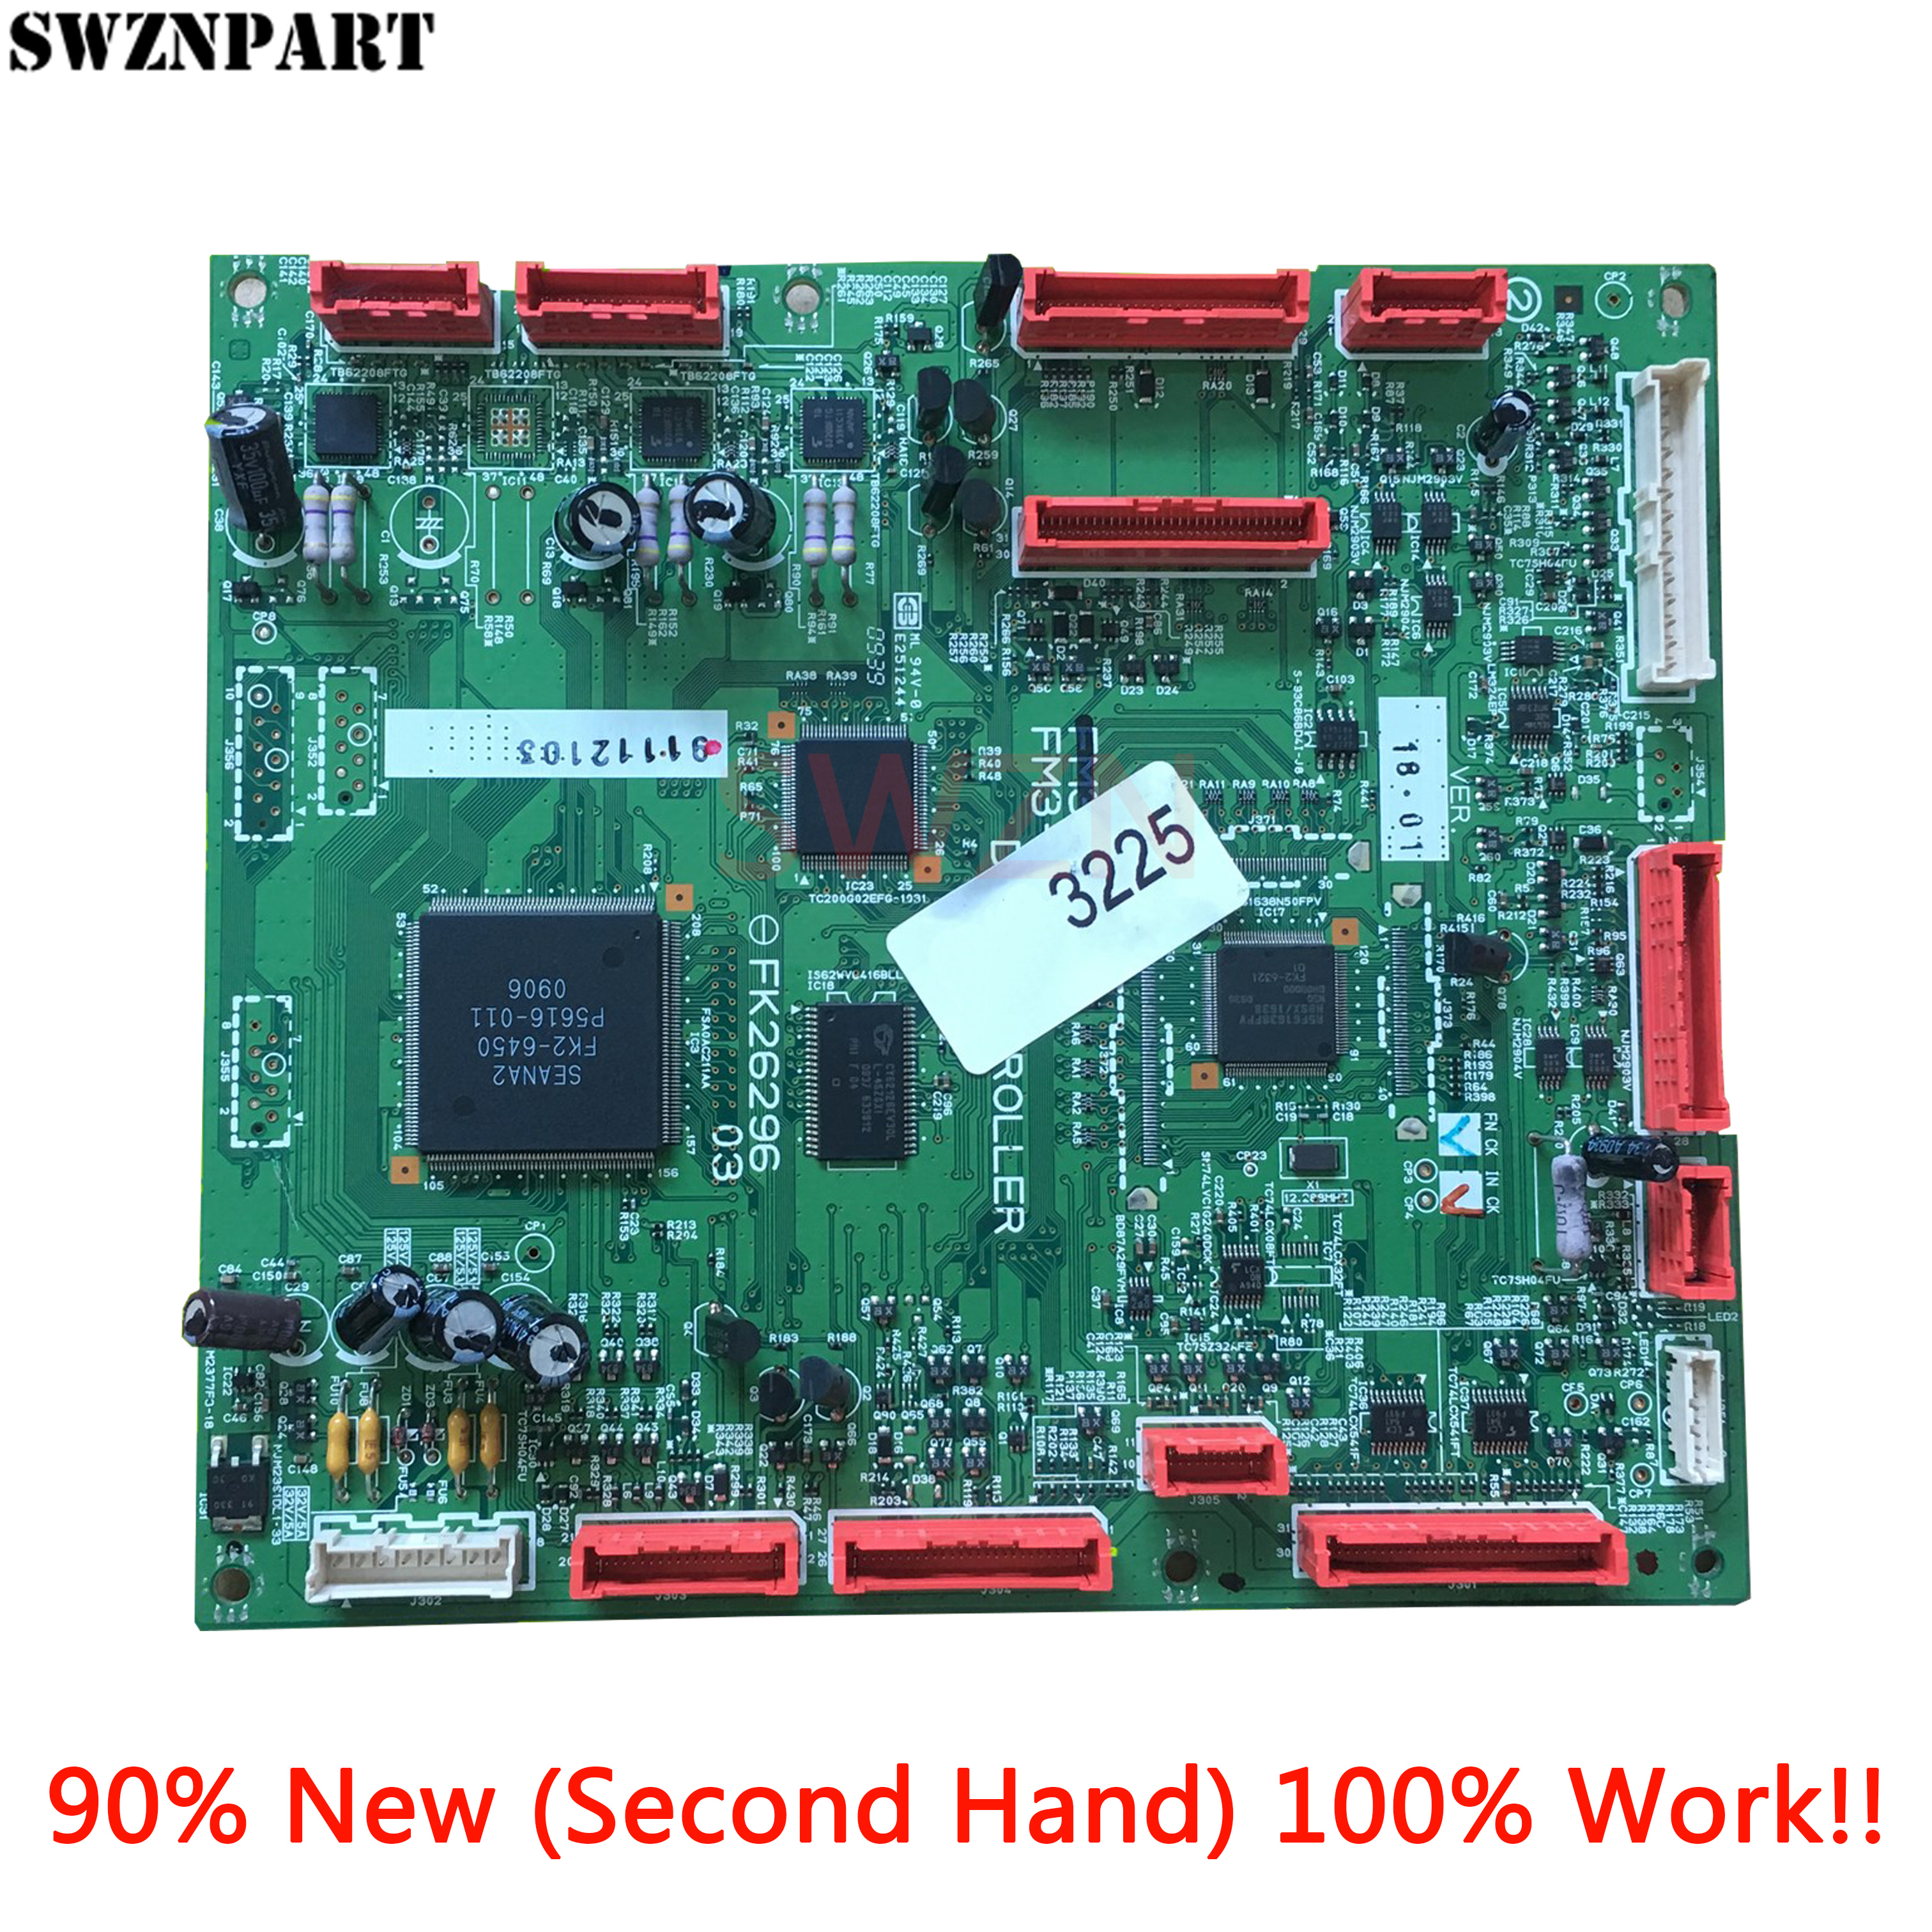 Contrôleur cc ASSY carte contrôleur cc pour Canon IR3225N IR3235N IR3245N IR3225 3225 3245 3235